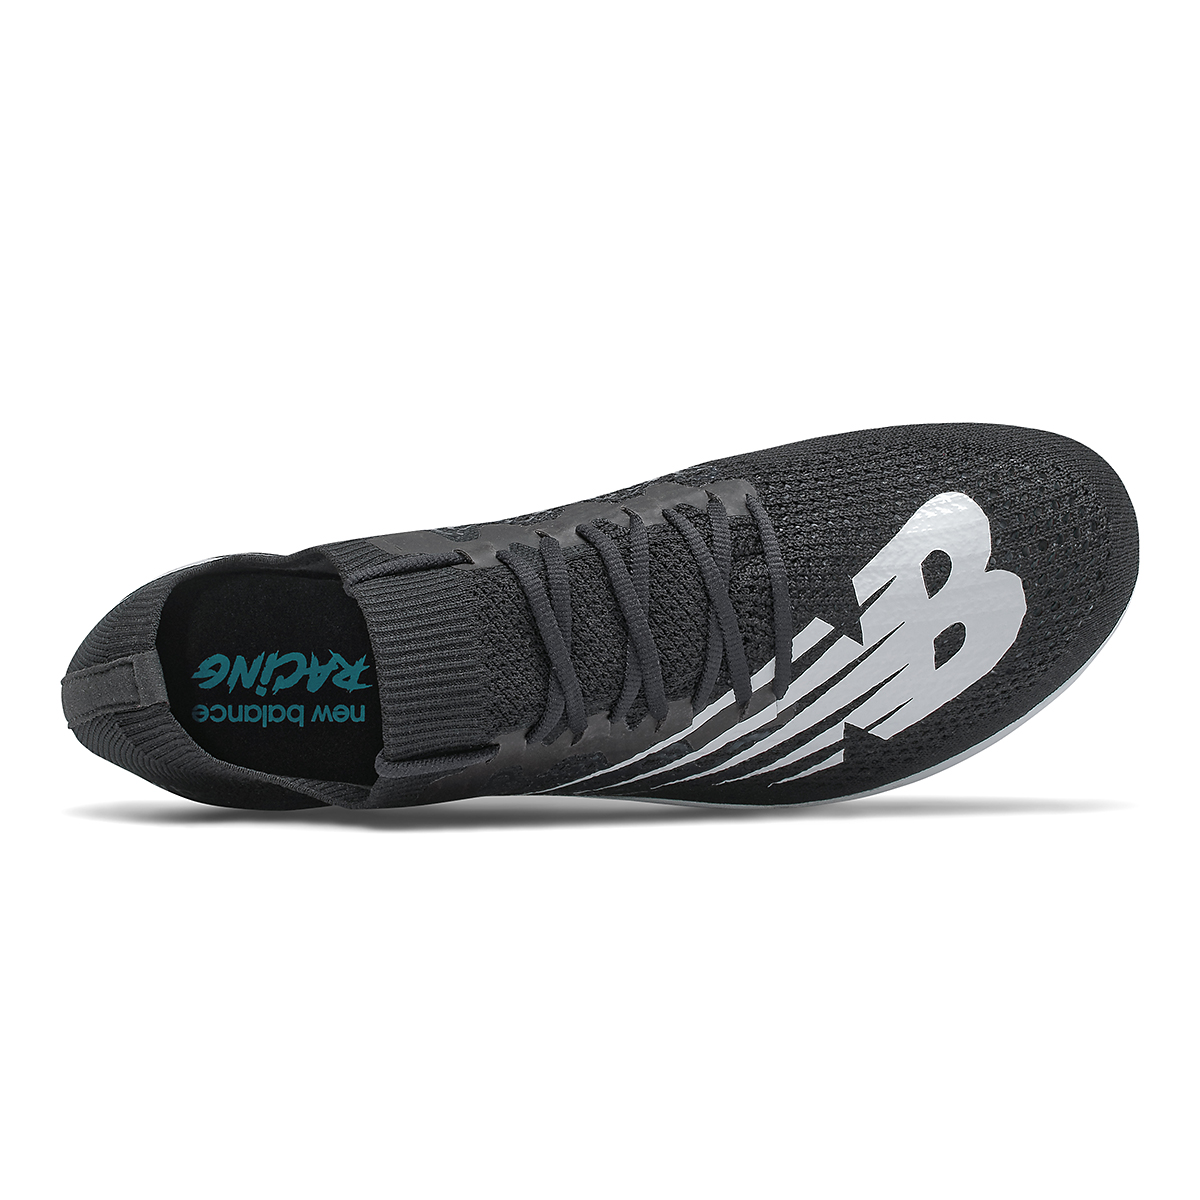 Women's New Balance LD5Kv8 Track Spikes - Color: Black/White - Size: 6 - Width: Regular, Black/White, large, image 3